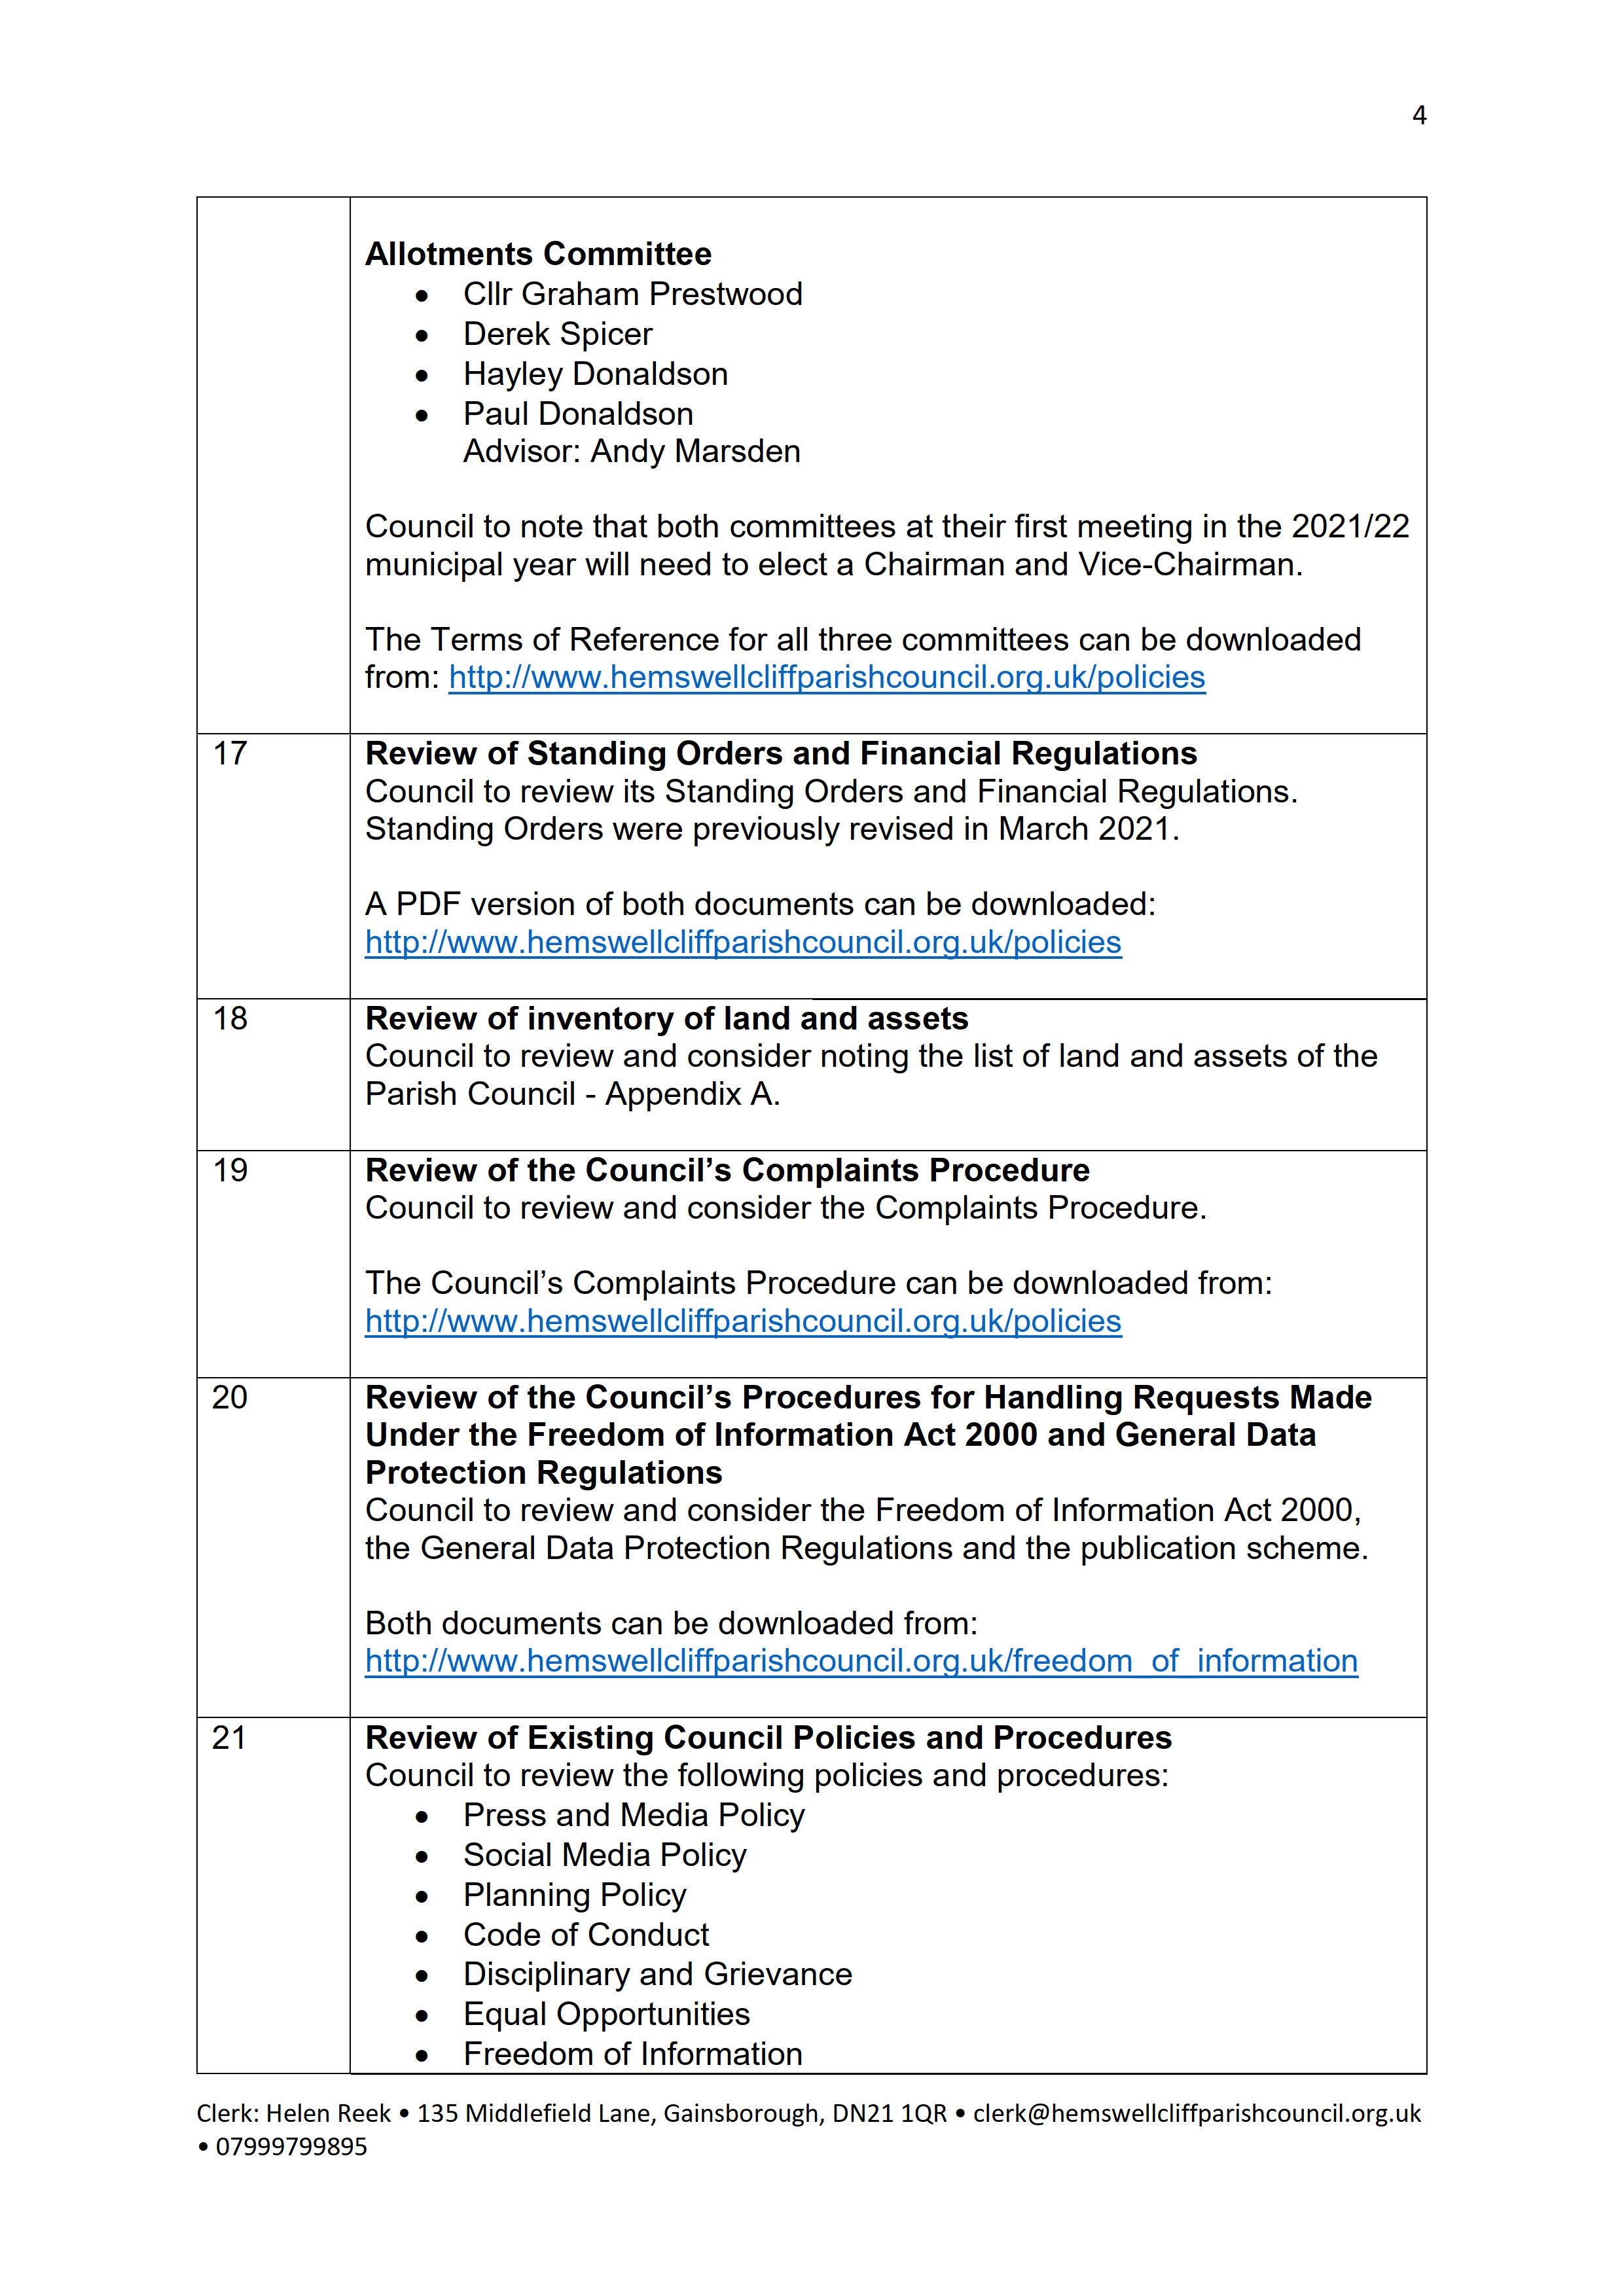 Annual_Meeting_Agenda_17.05.21_4.jpg